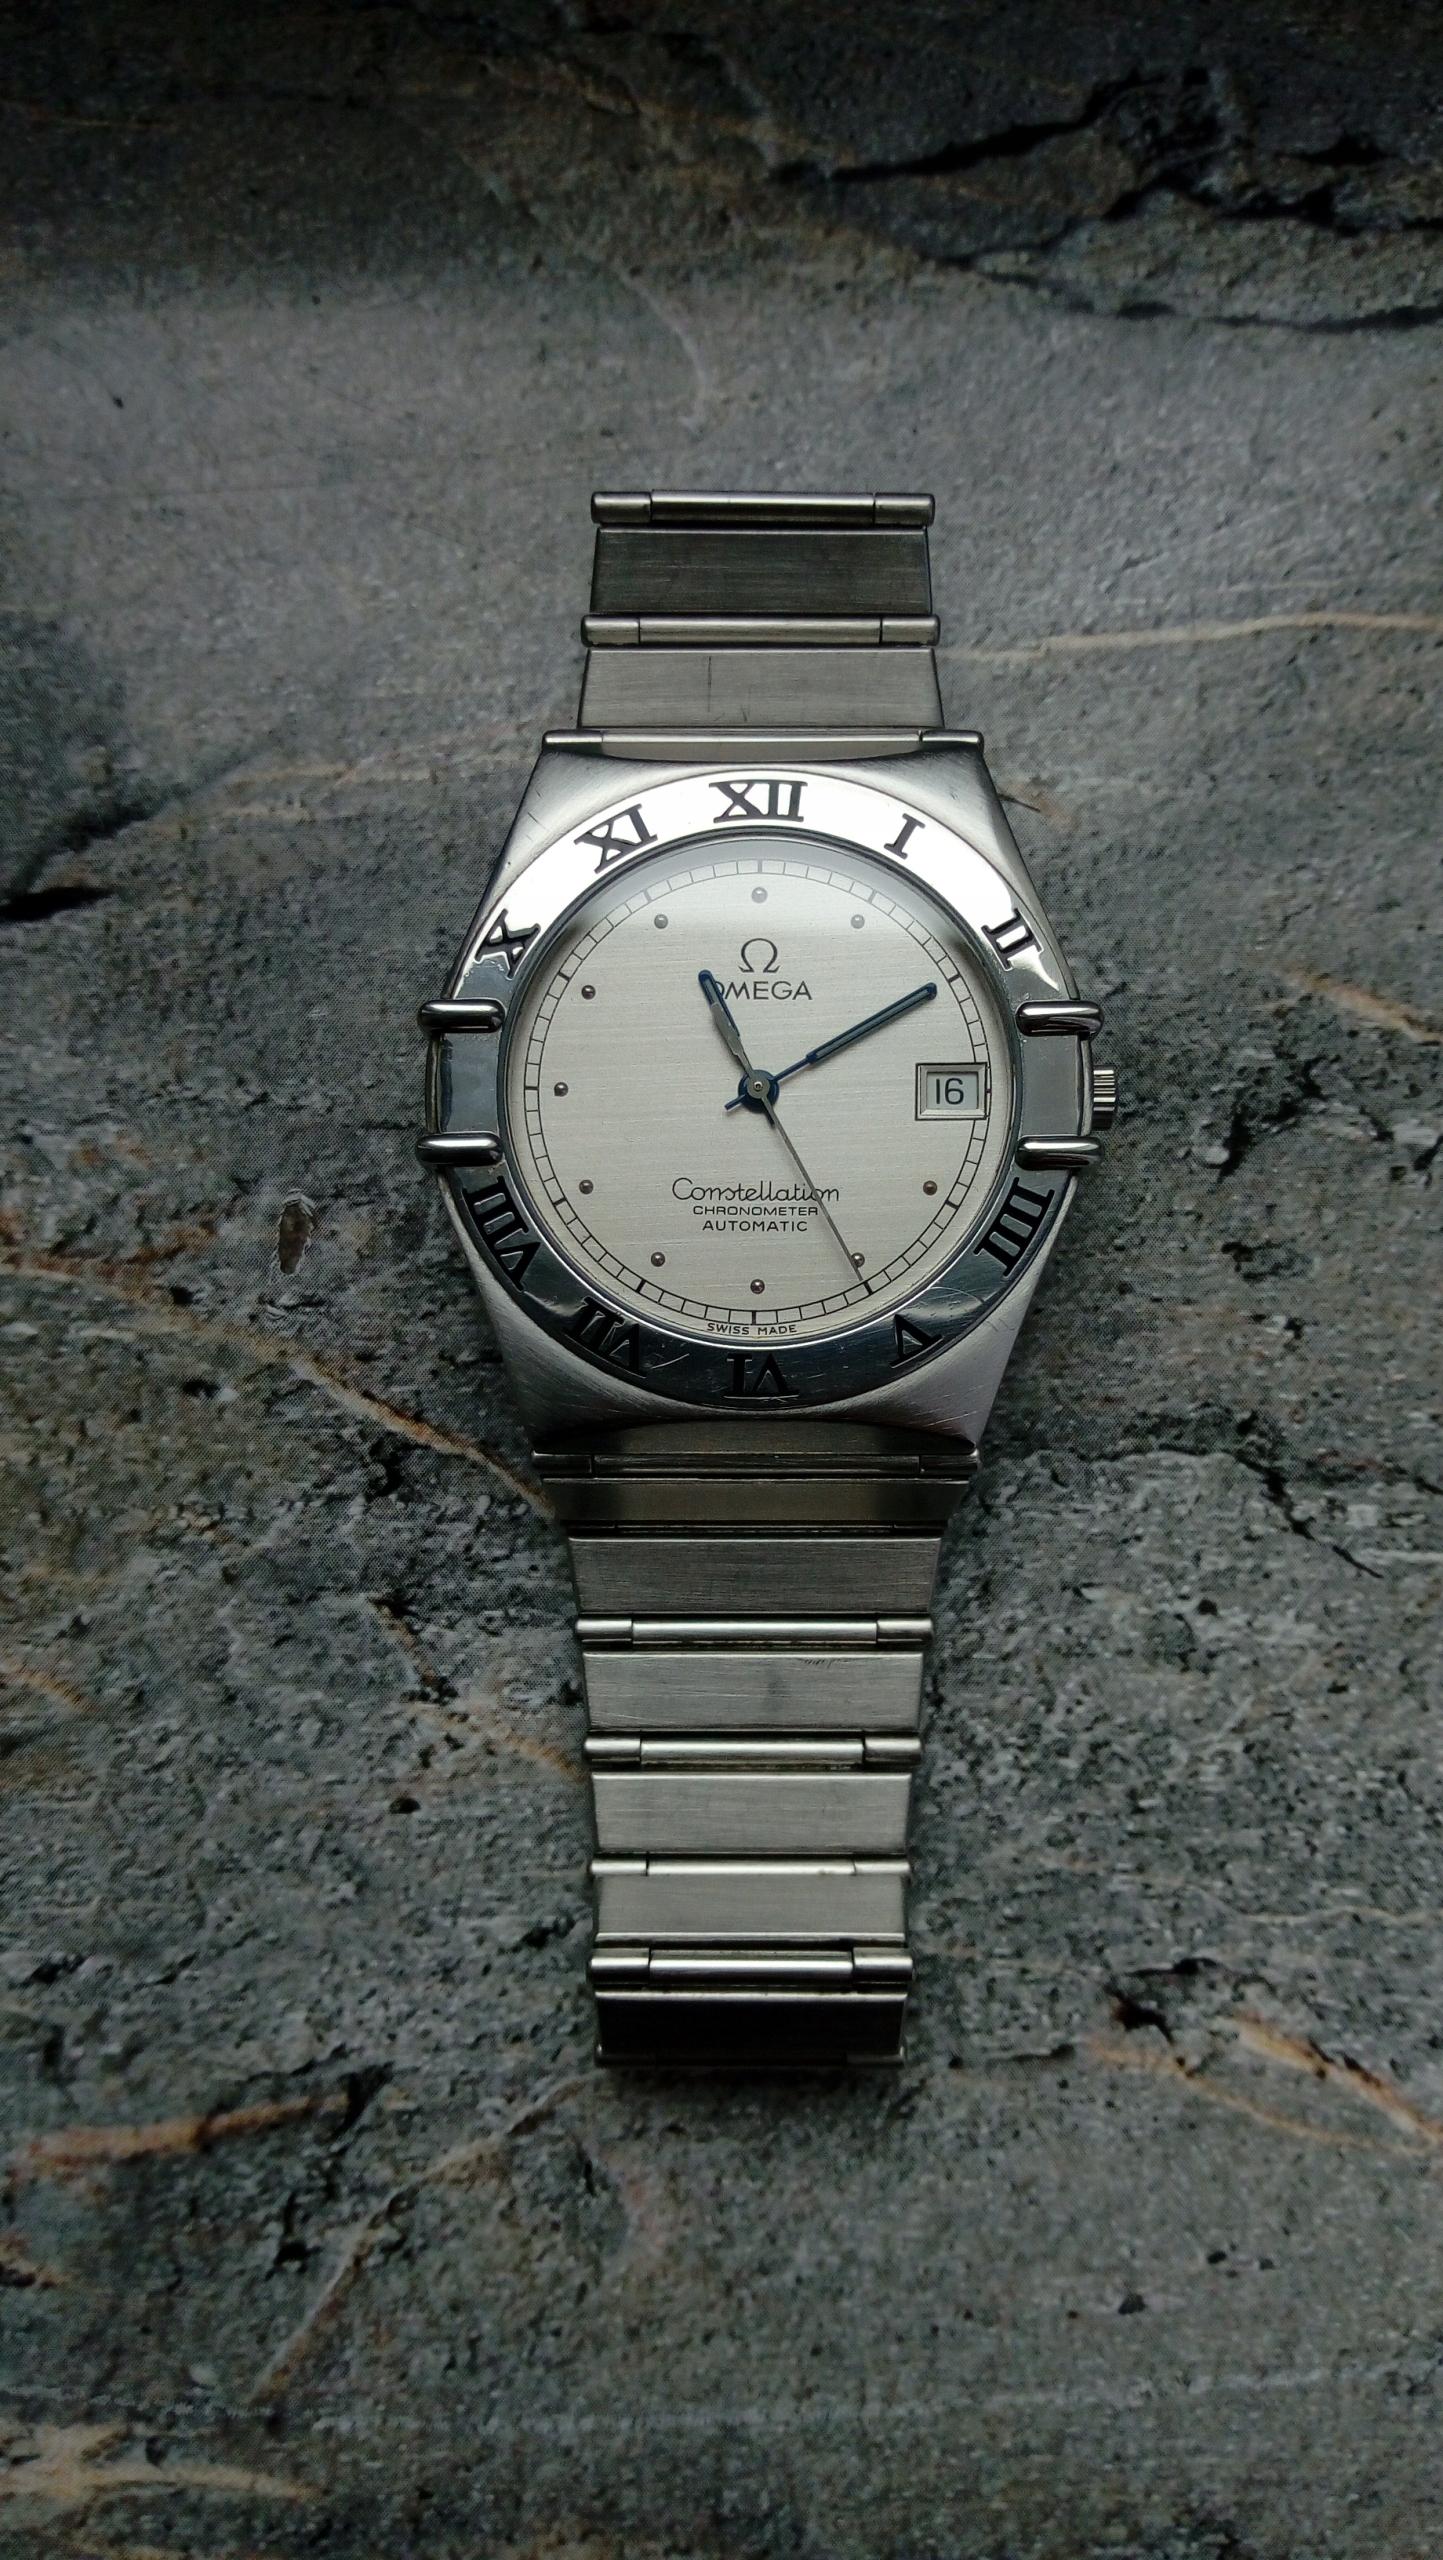 Omega Constellation Chronometer Automatic